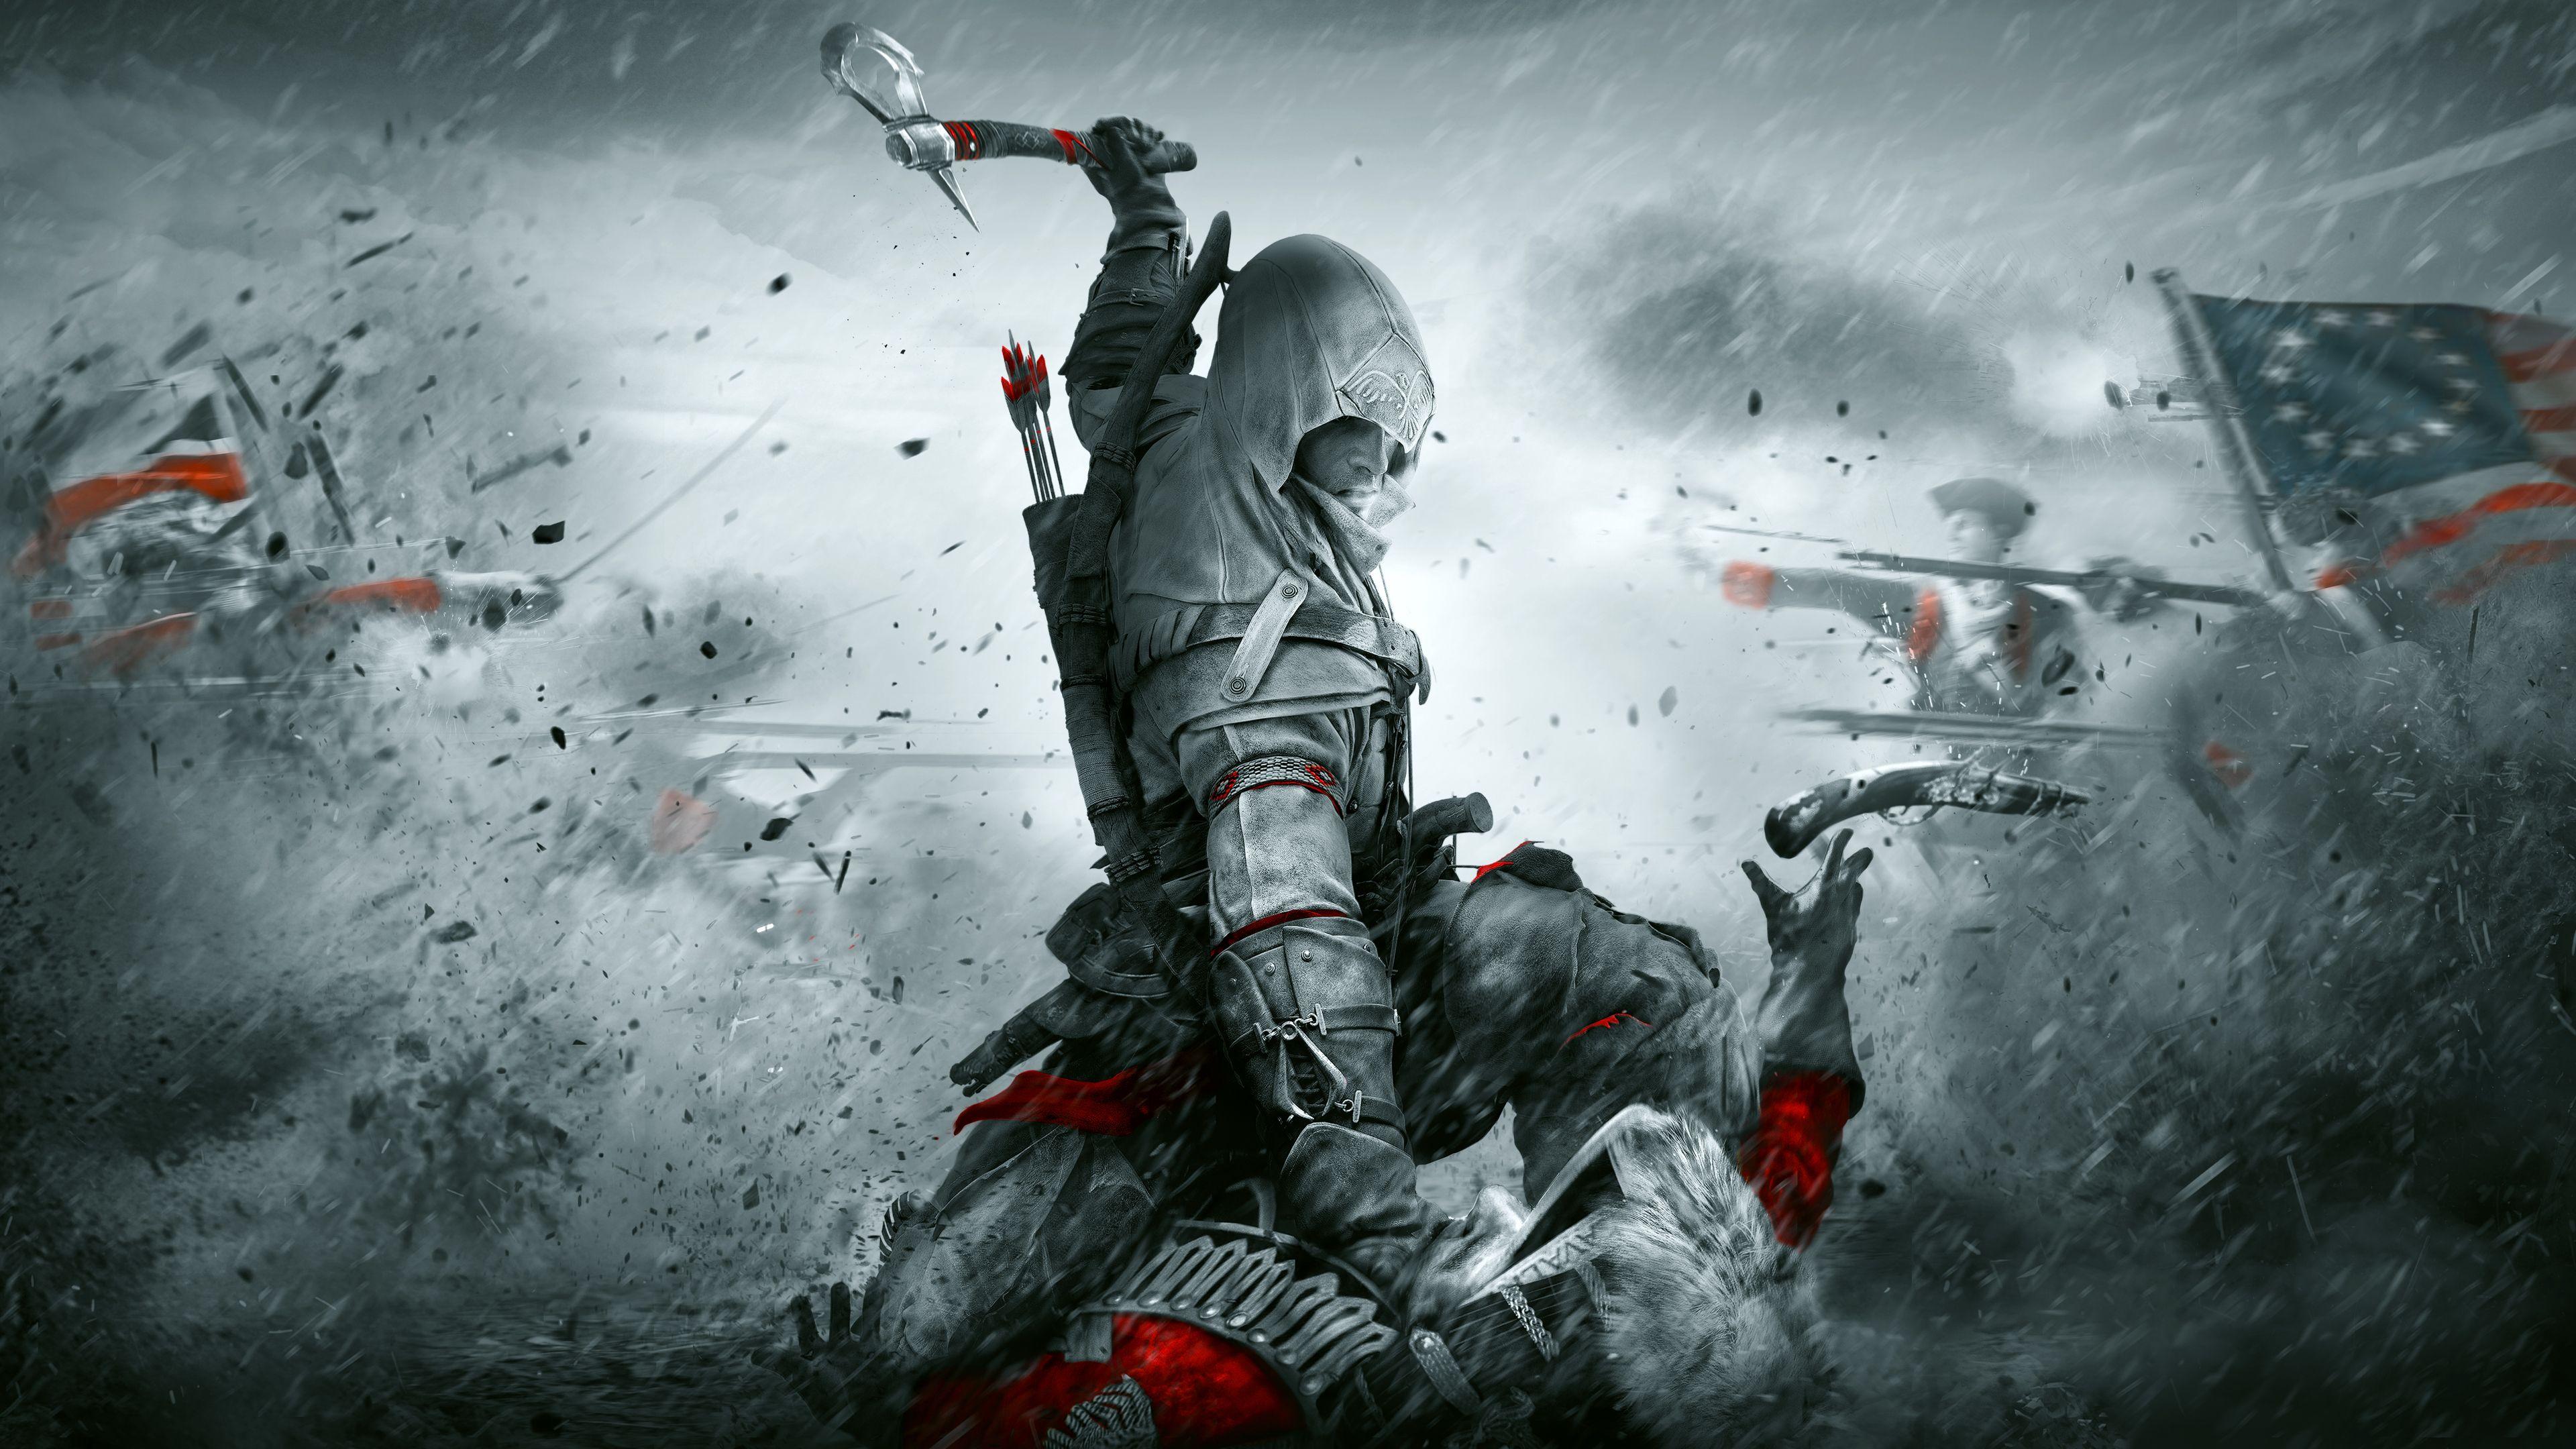 Assassin's Creed III wallpaper wallpaper gaming game